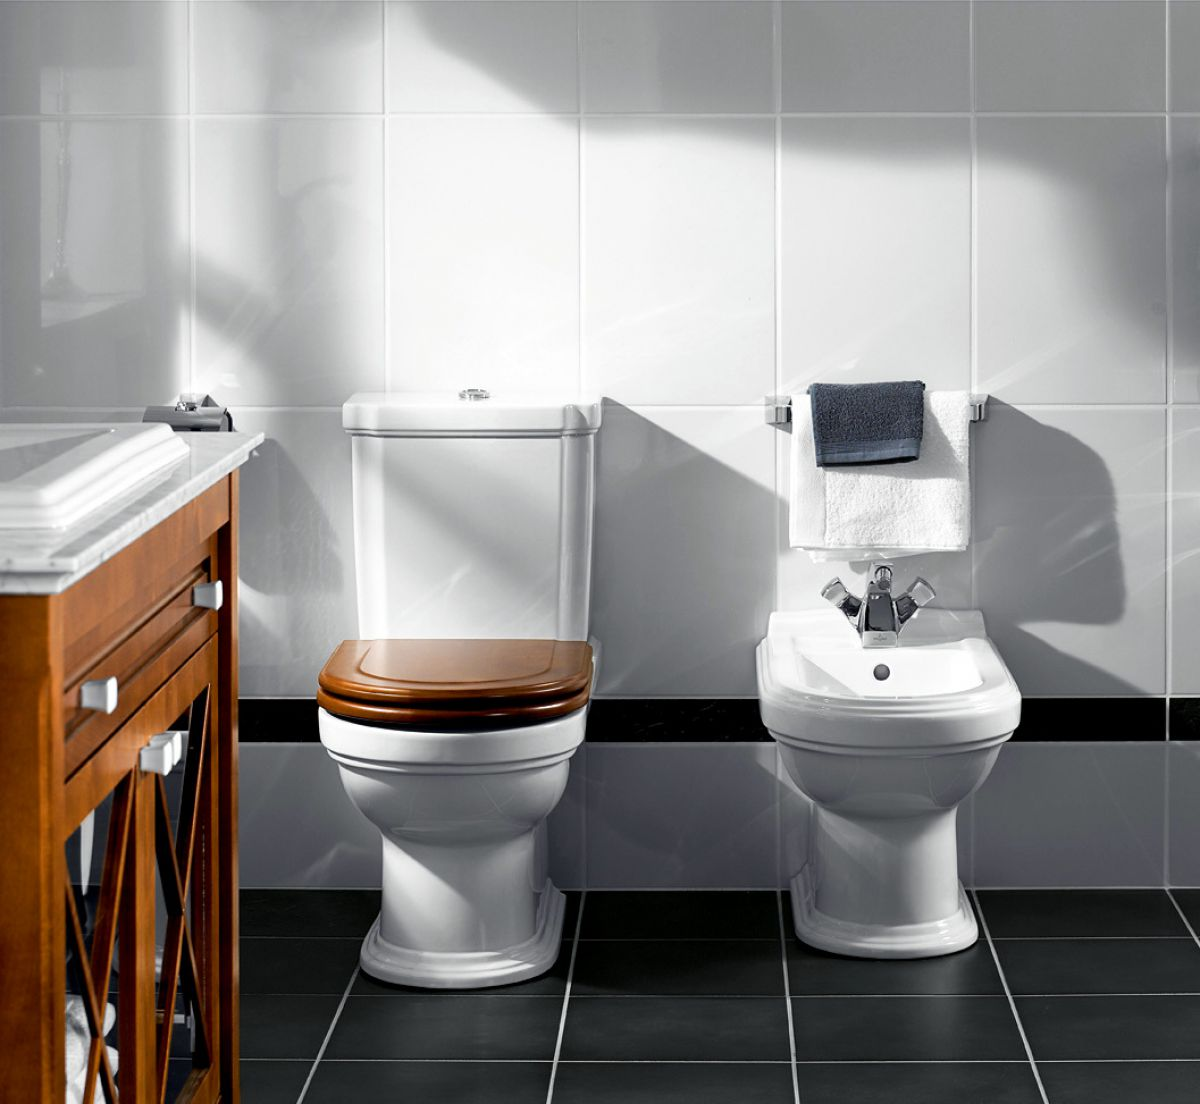 Villeroy boch hommage floor standing bidet uk bathrooms for Villeroy boch sale